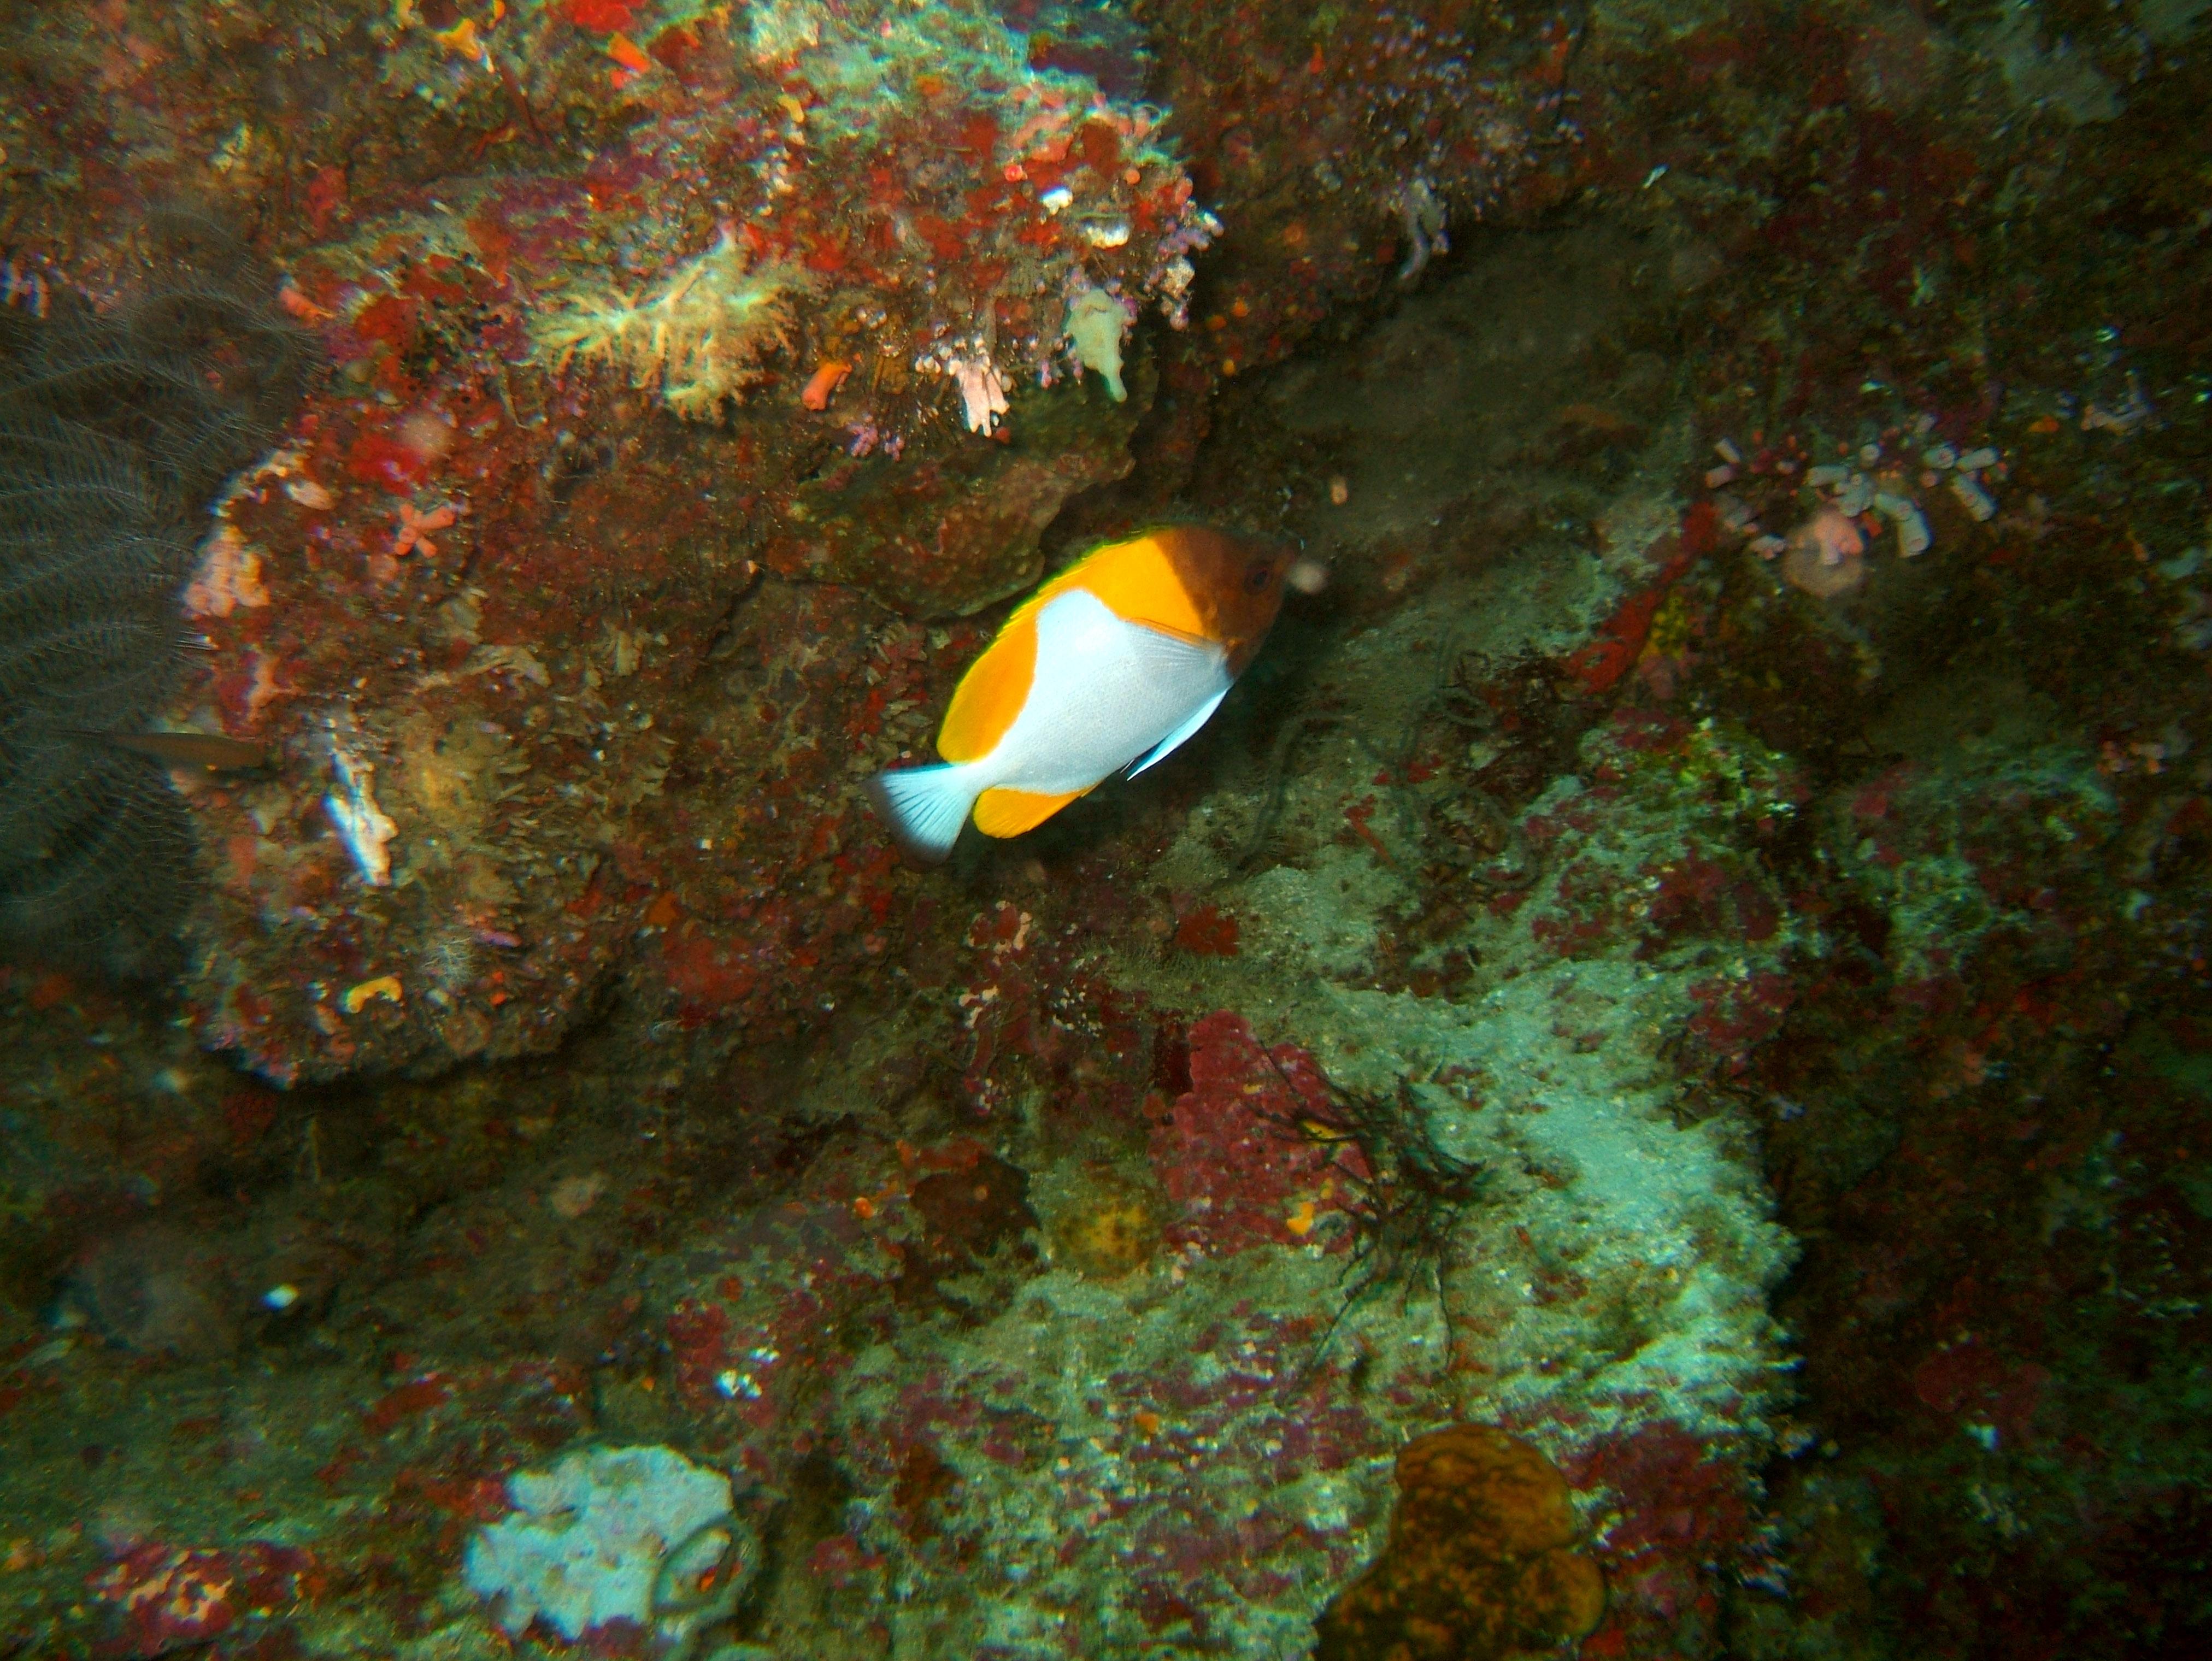 Philippines Cebu Bohol Balicasag Island Black Forest dive Dec 2005 17